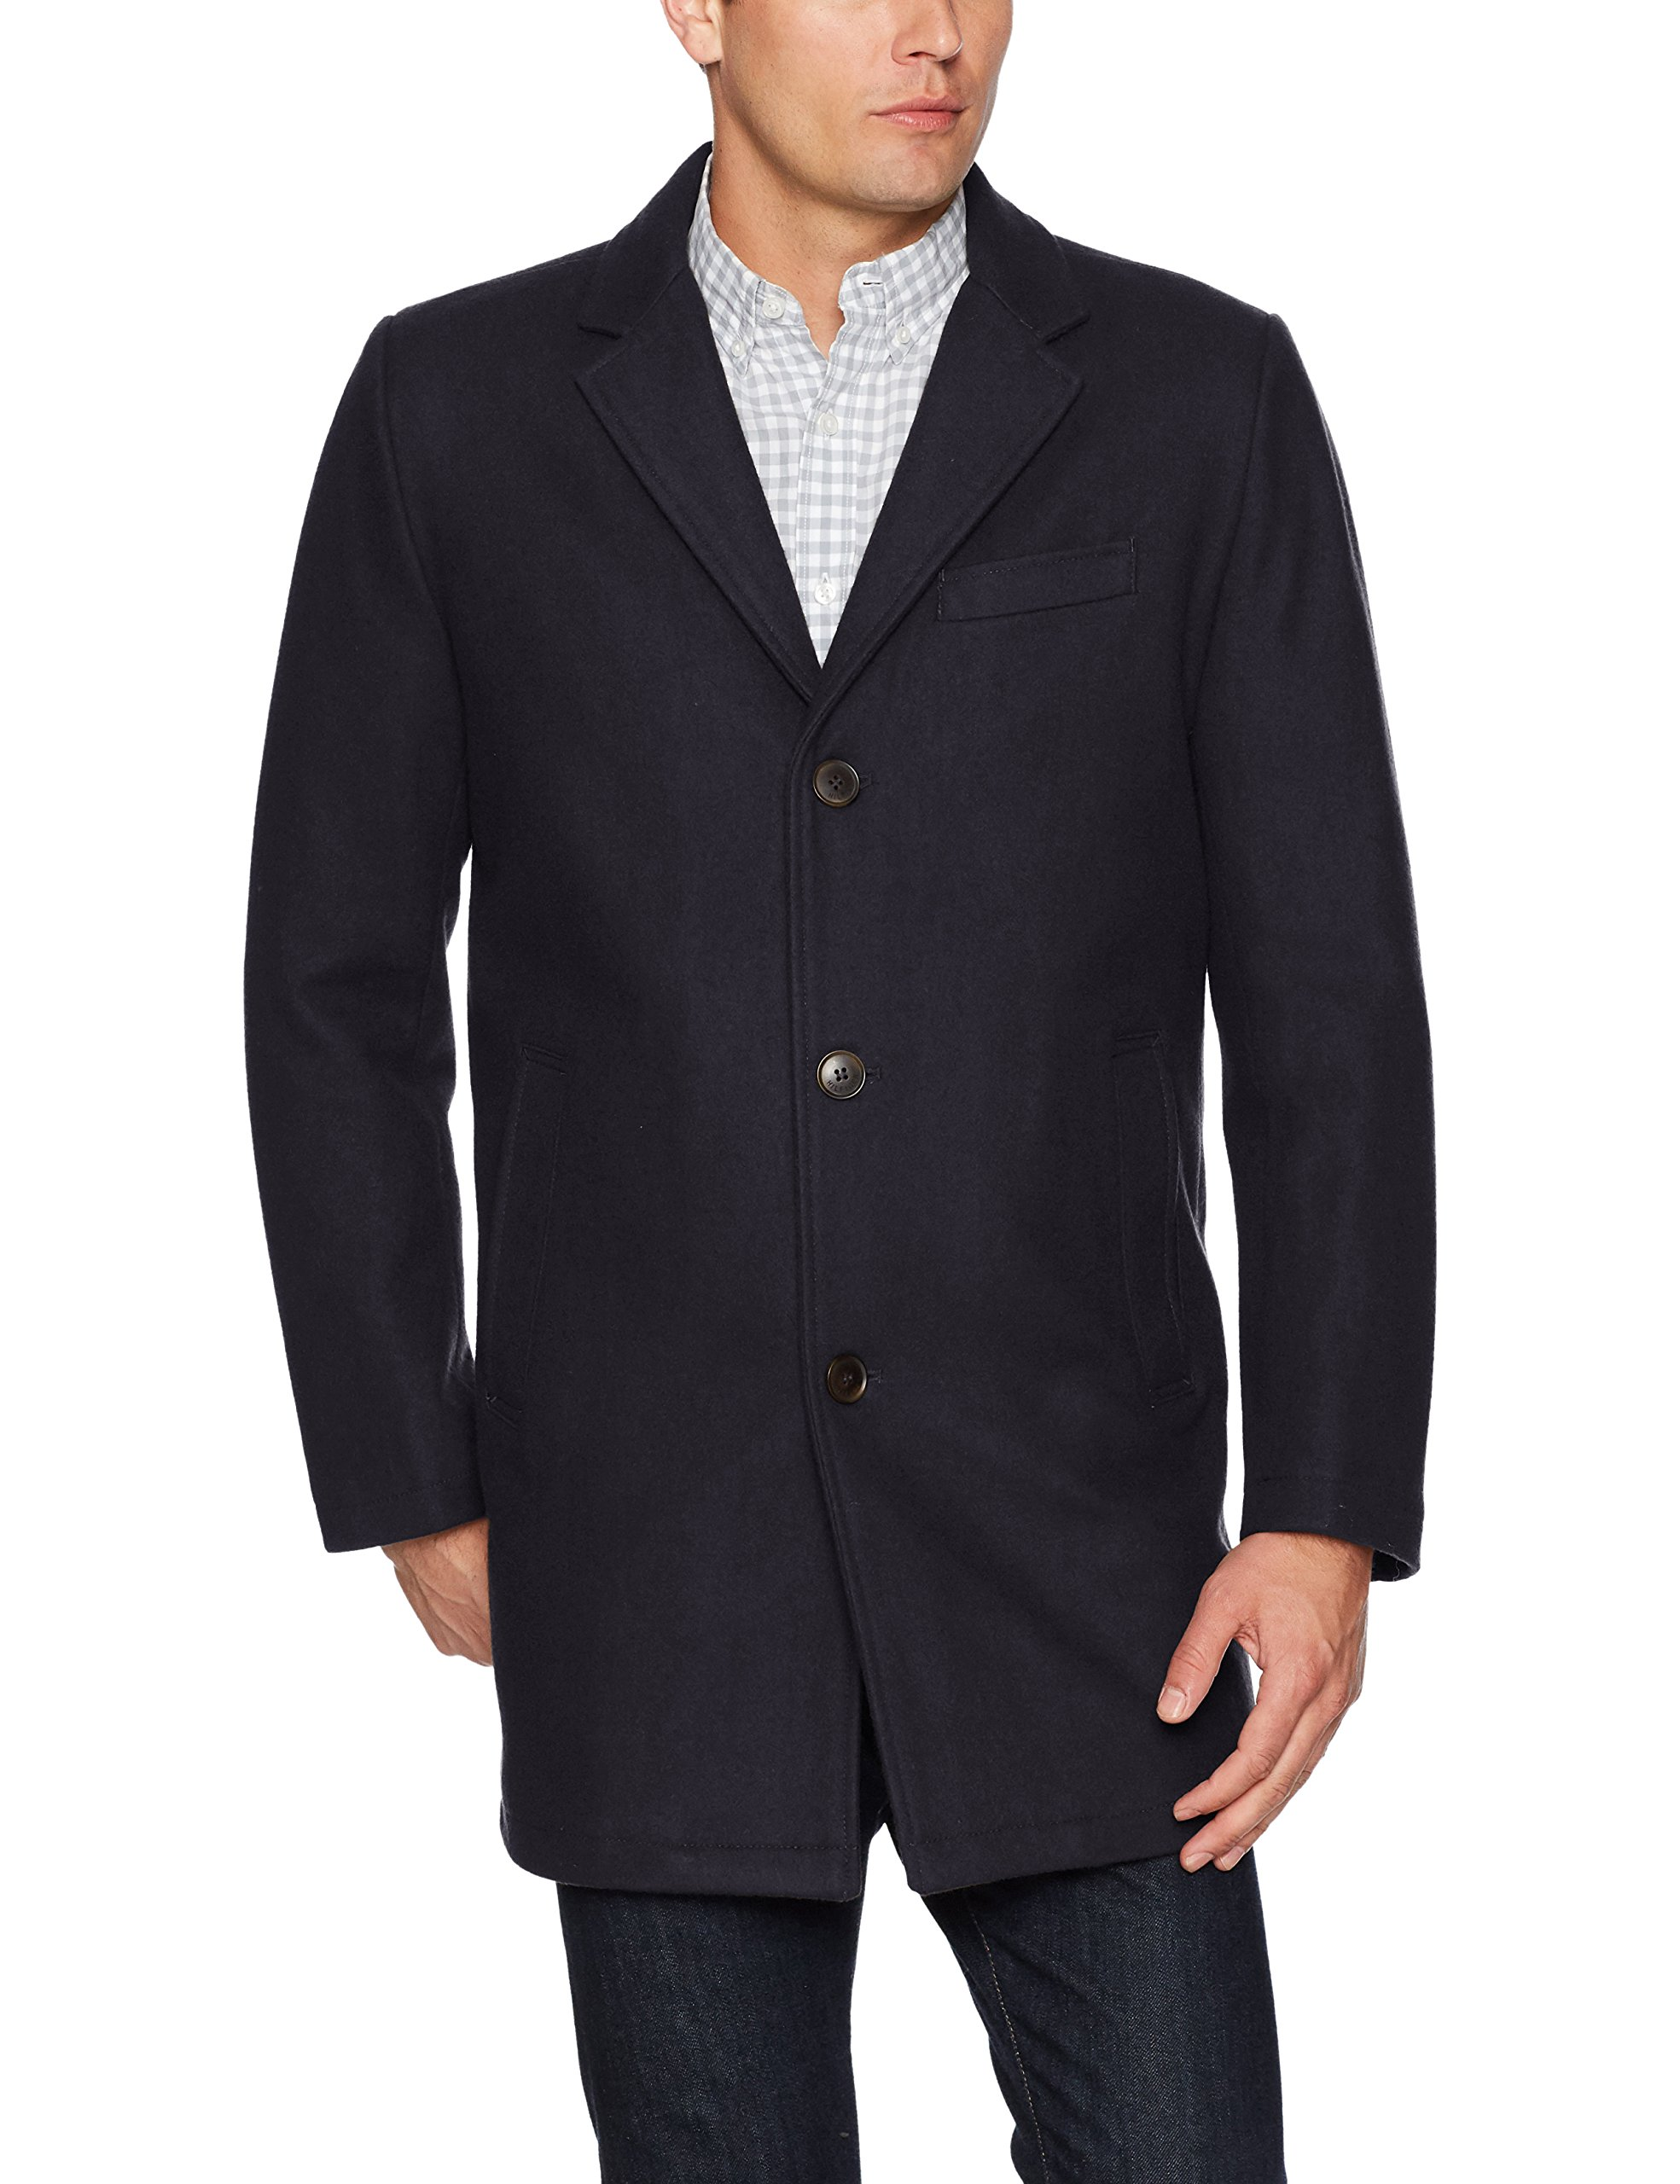 Tommy Hilfiger Men's Wool Tailored Top Coat, Navy, Medium